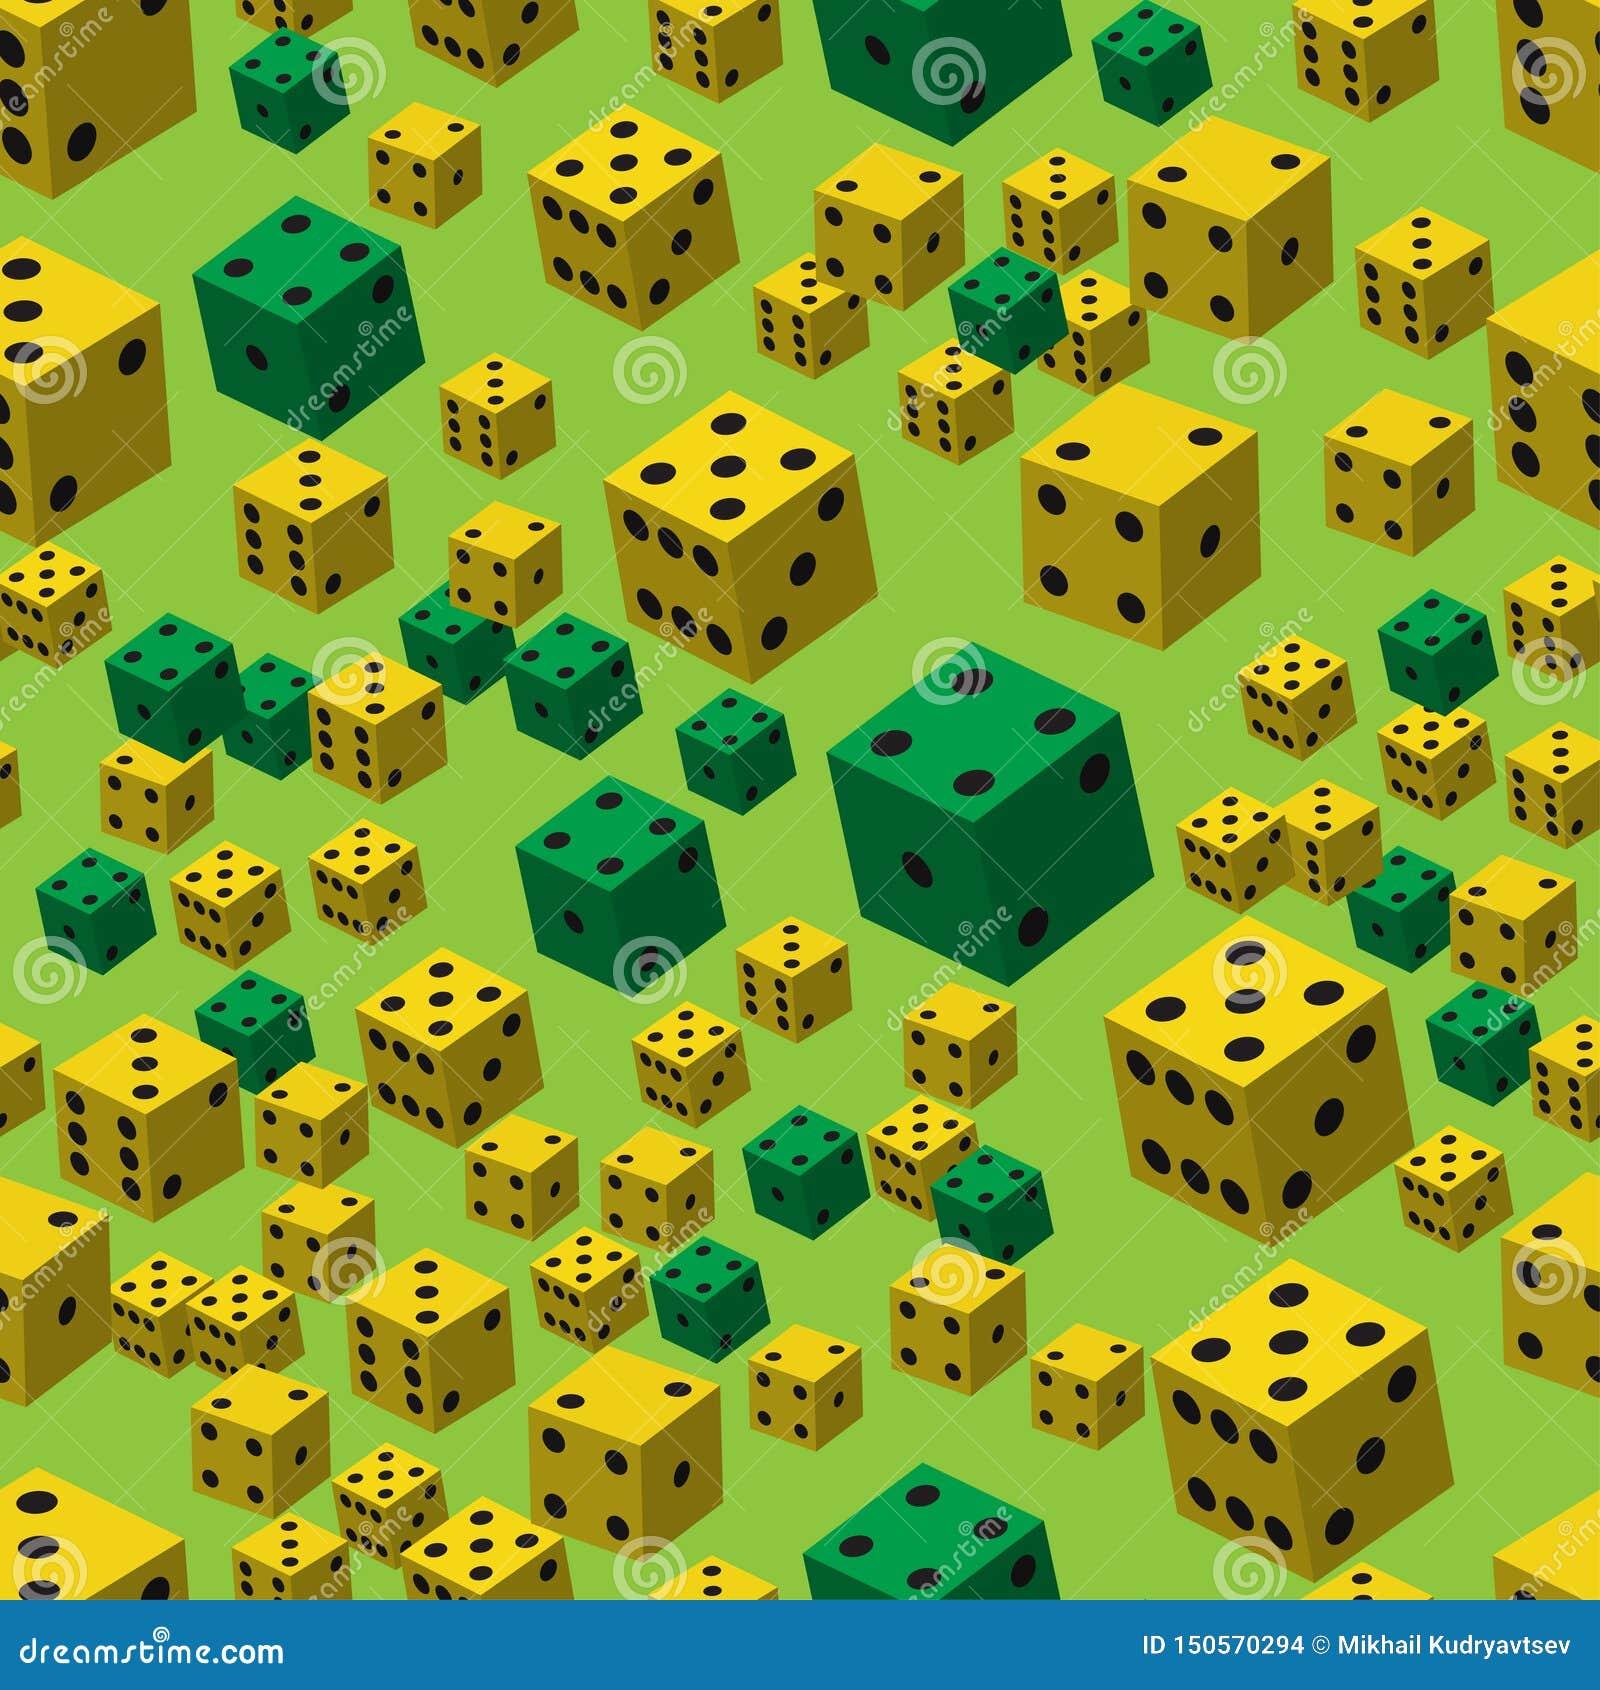 Yellow Green Dice Seamless Pattern, 3D illustration